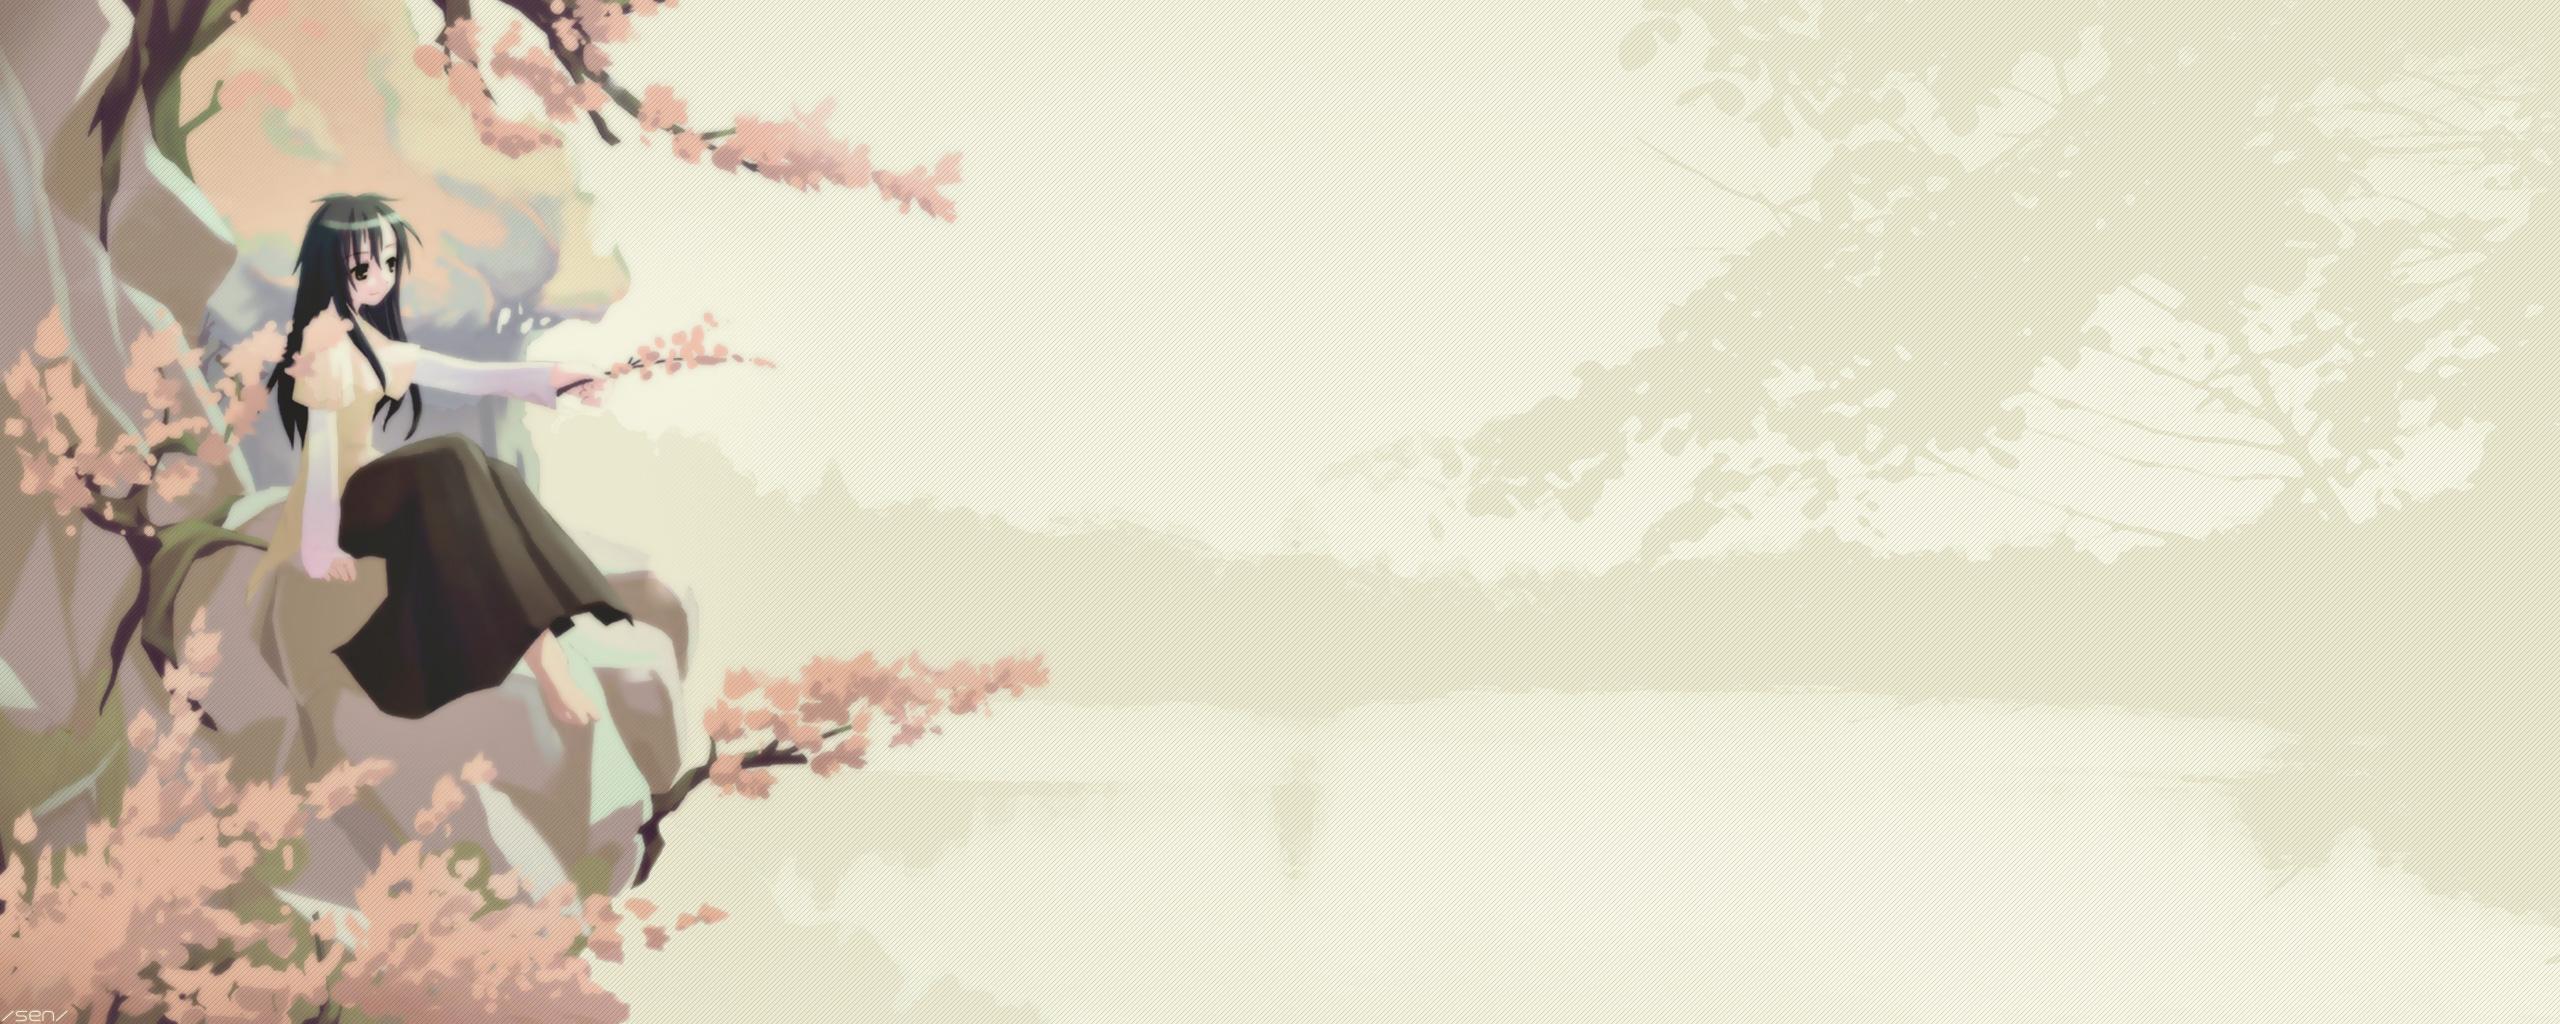 Anime Cherry Blossoms Wallpaper Dual cherry wallpaper 2560x1024